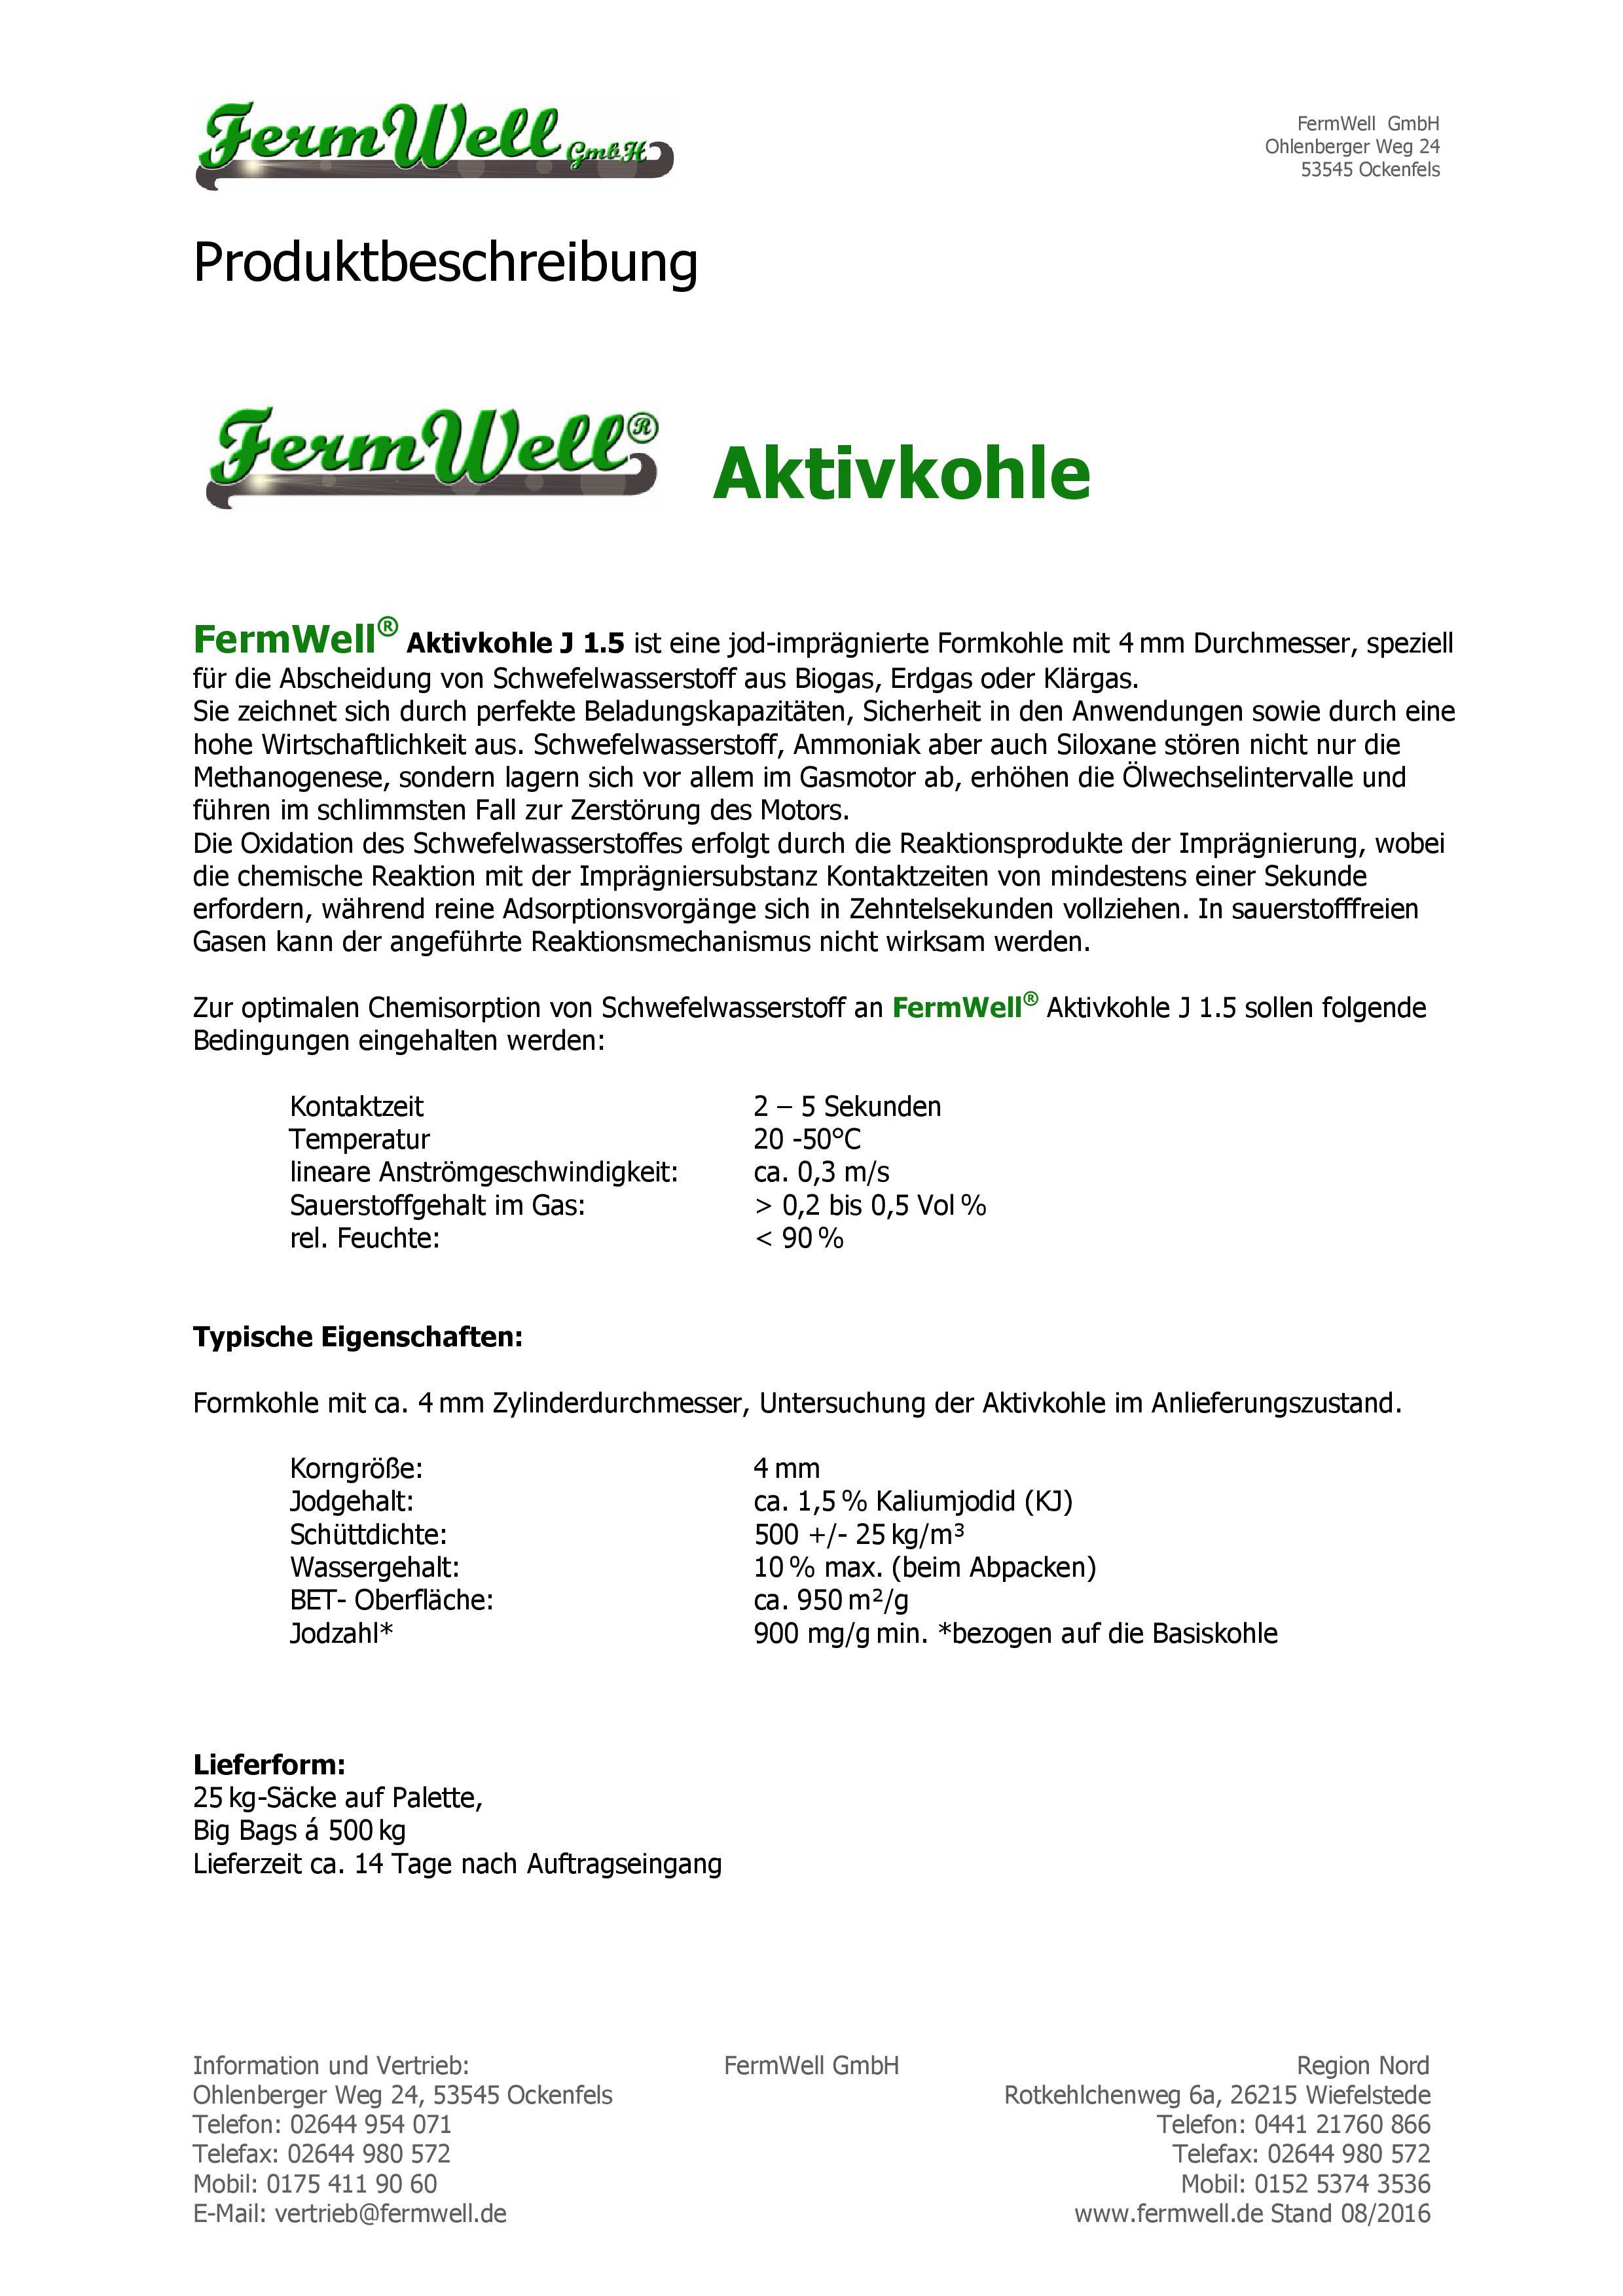 FWG_Aktivkohle J1.5_Produktbeschreib_161